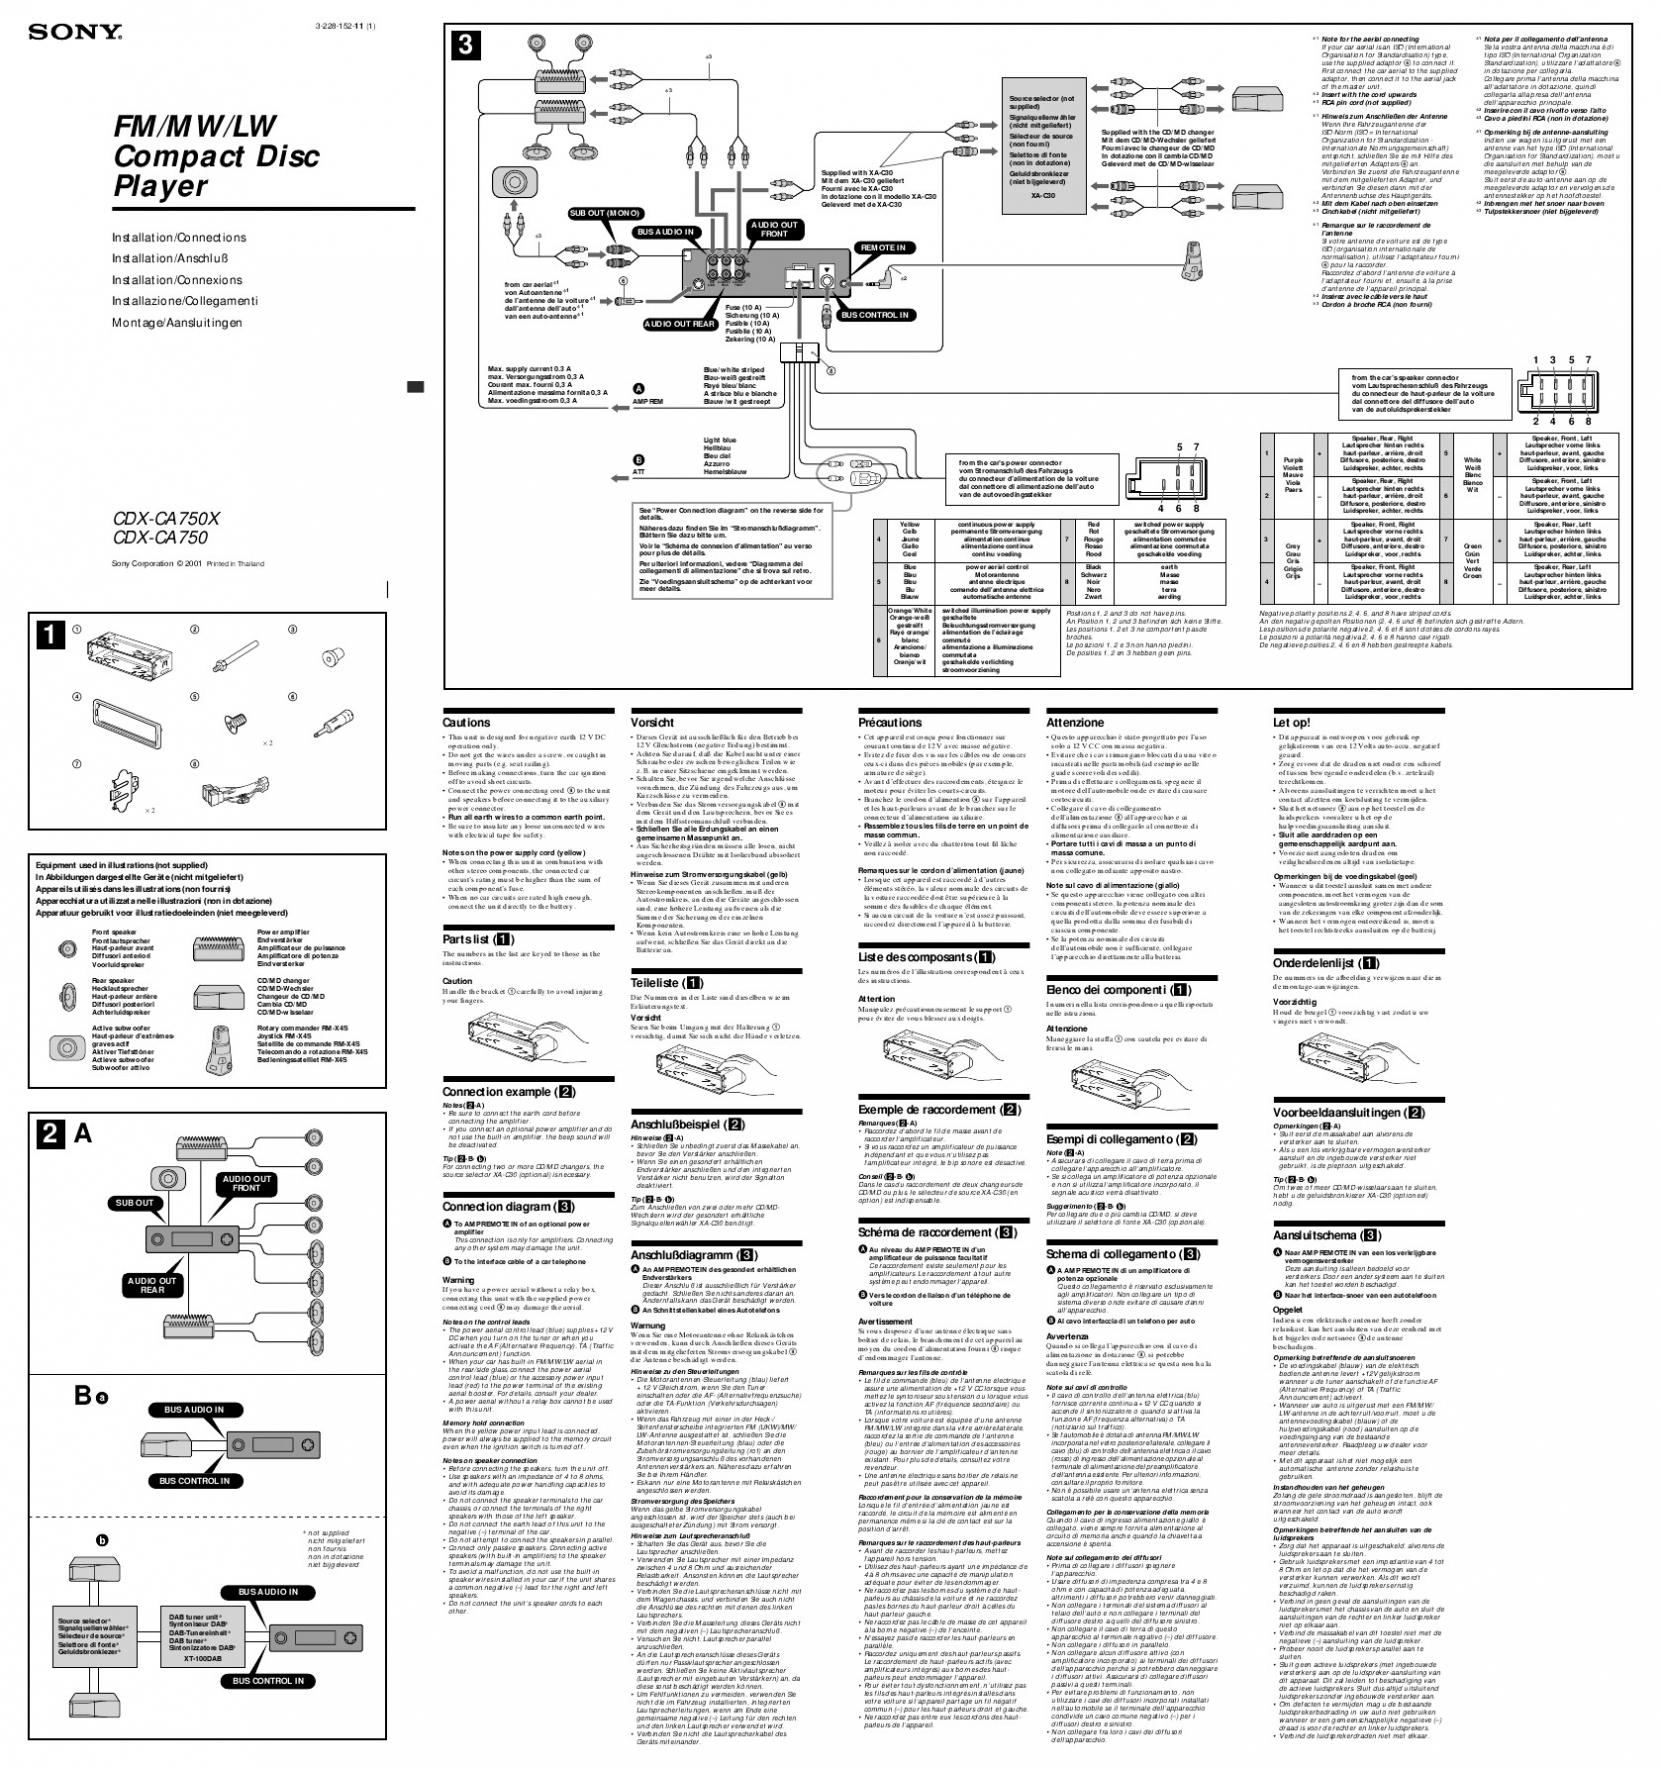 Sony Xplod Wiring Diagram – Wiring Diagram For Sony Xplod Car Stereo - Sony Explod Wiring Diagram